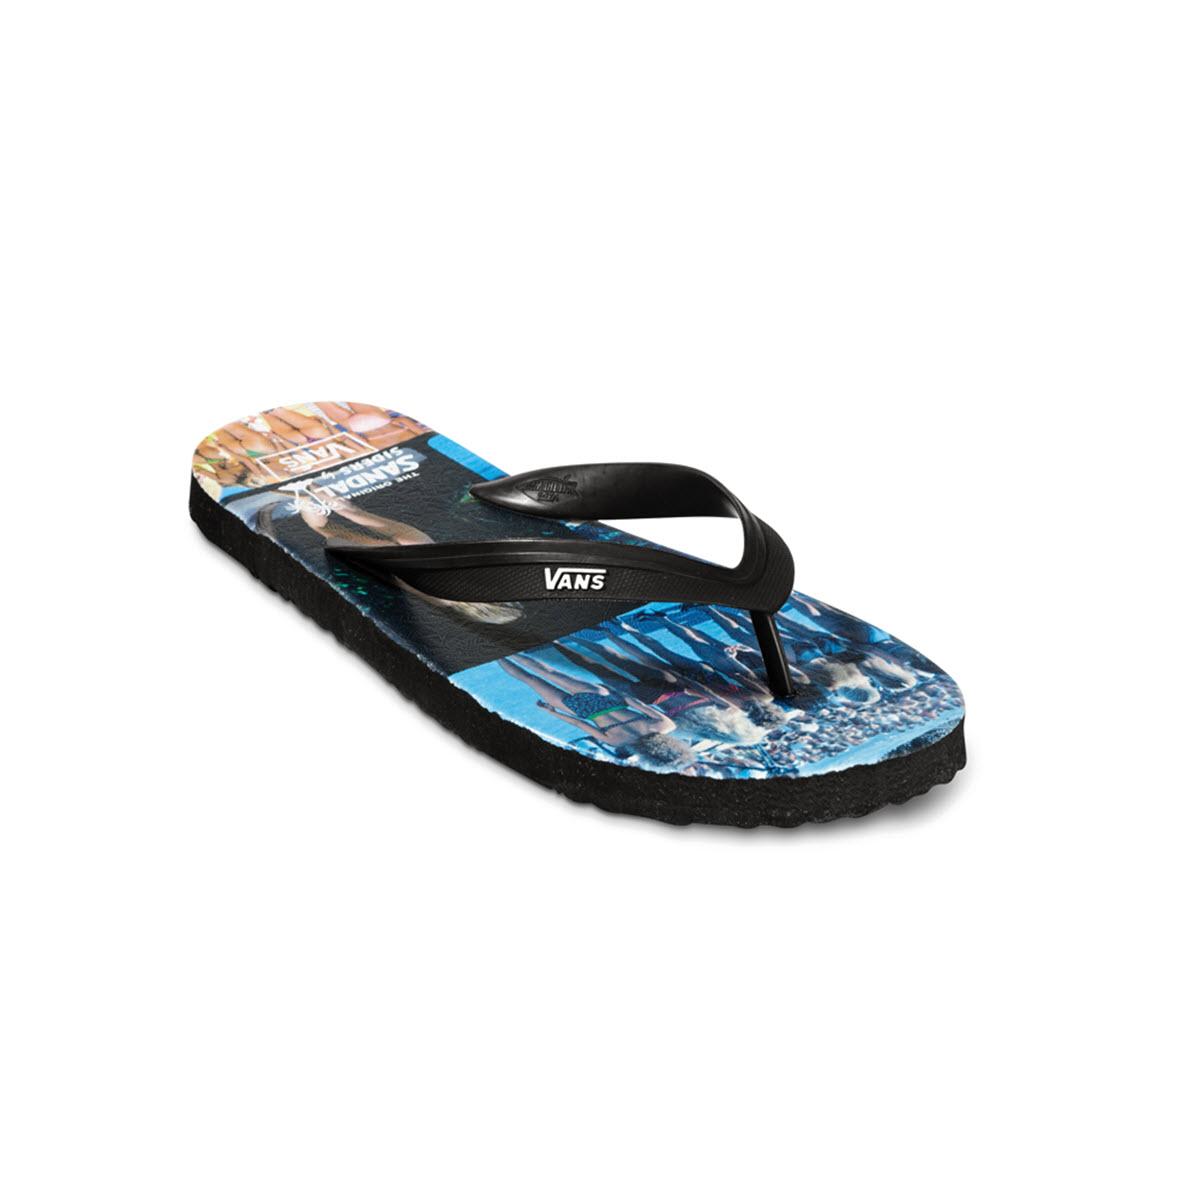 54044bcdd03 Vans Lanai Mens Flip Flops Sandals